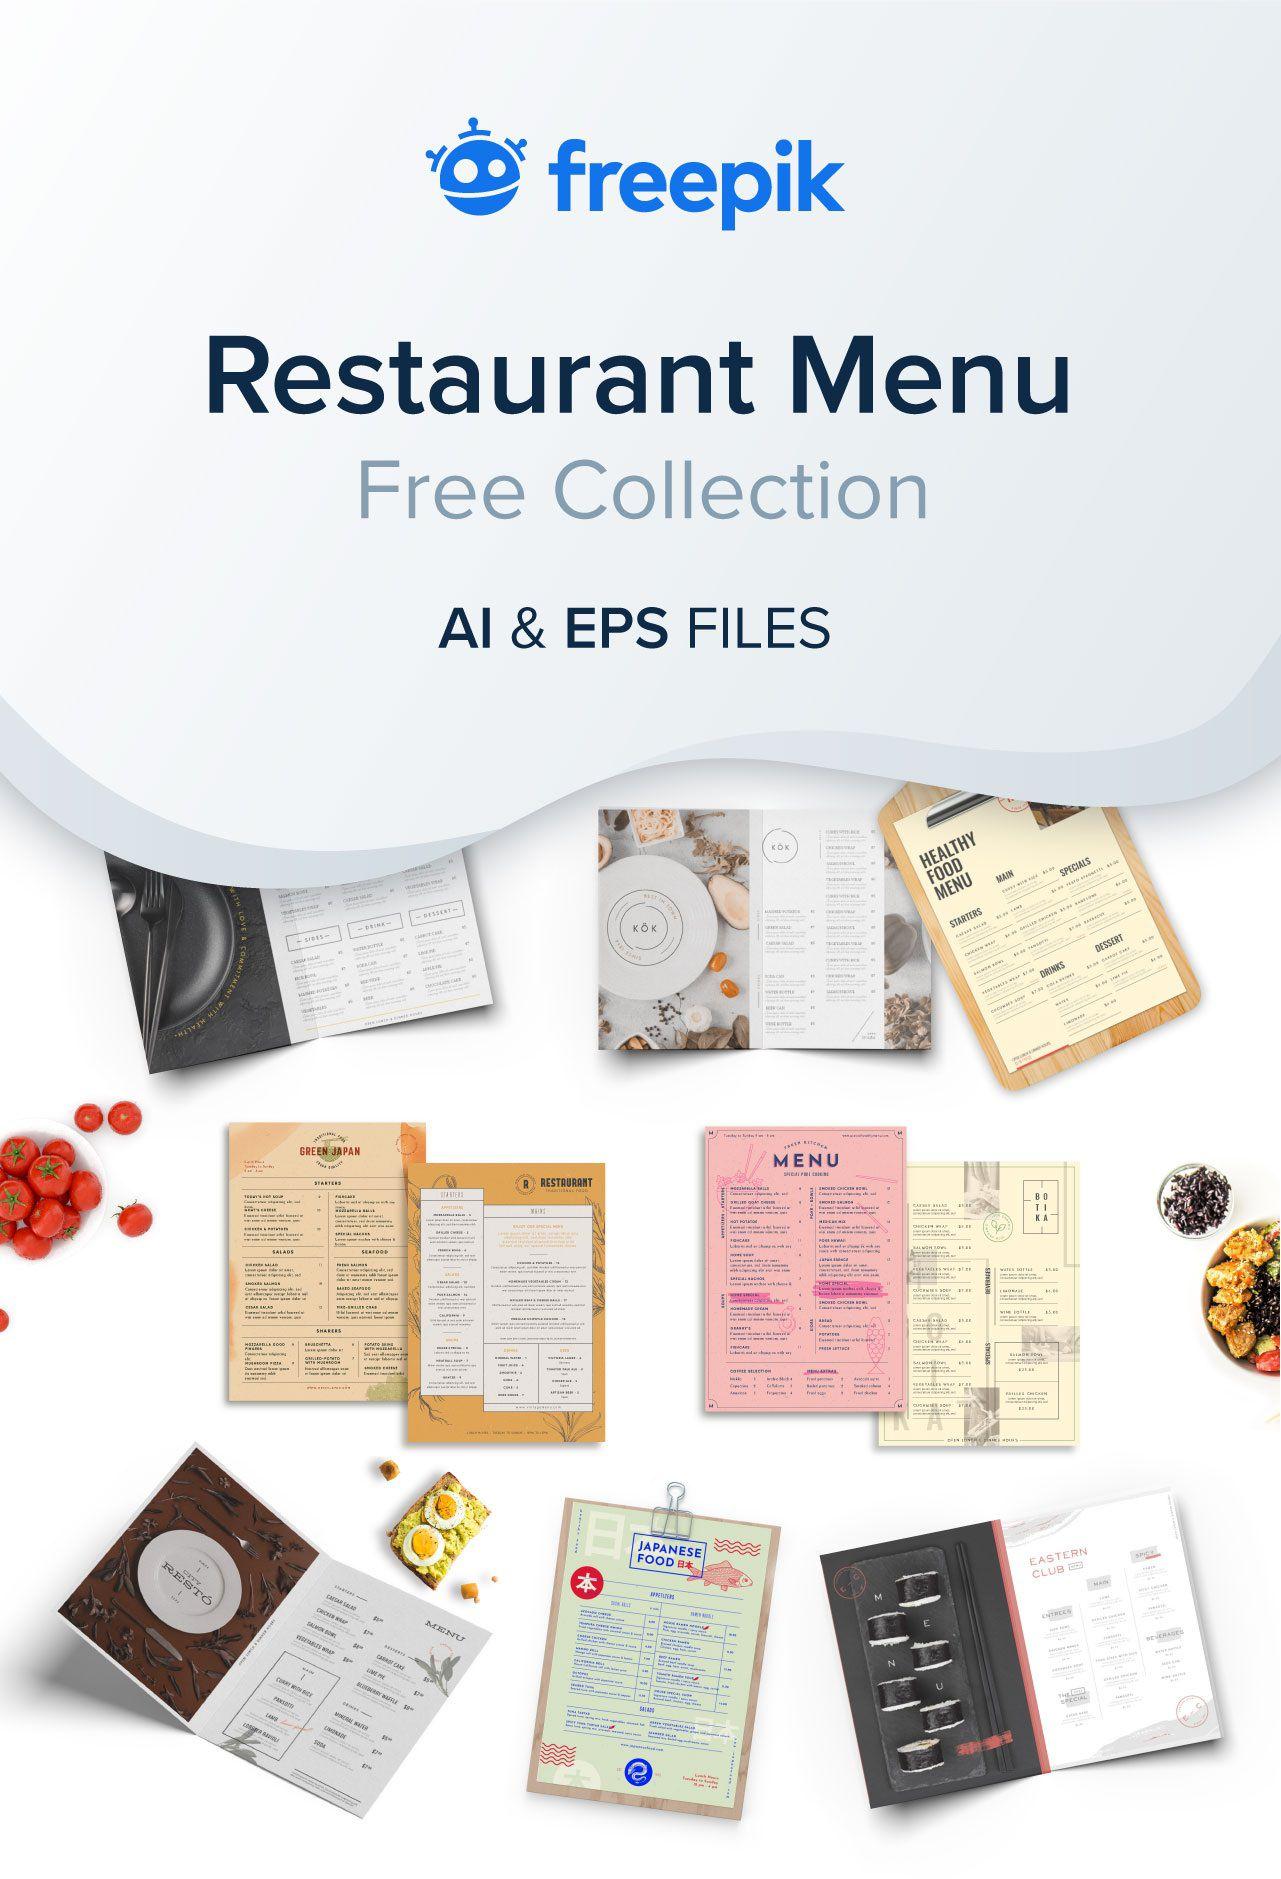 007 Outstanding Free Menu Template Download Example  Beauty Parlour Card Html Design RestaurantFull